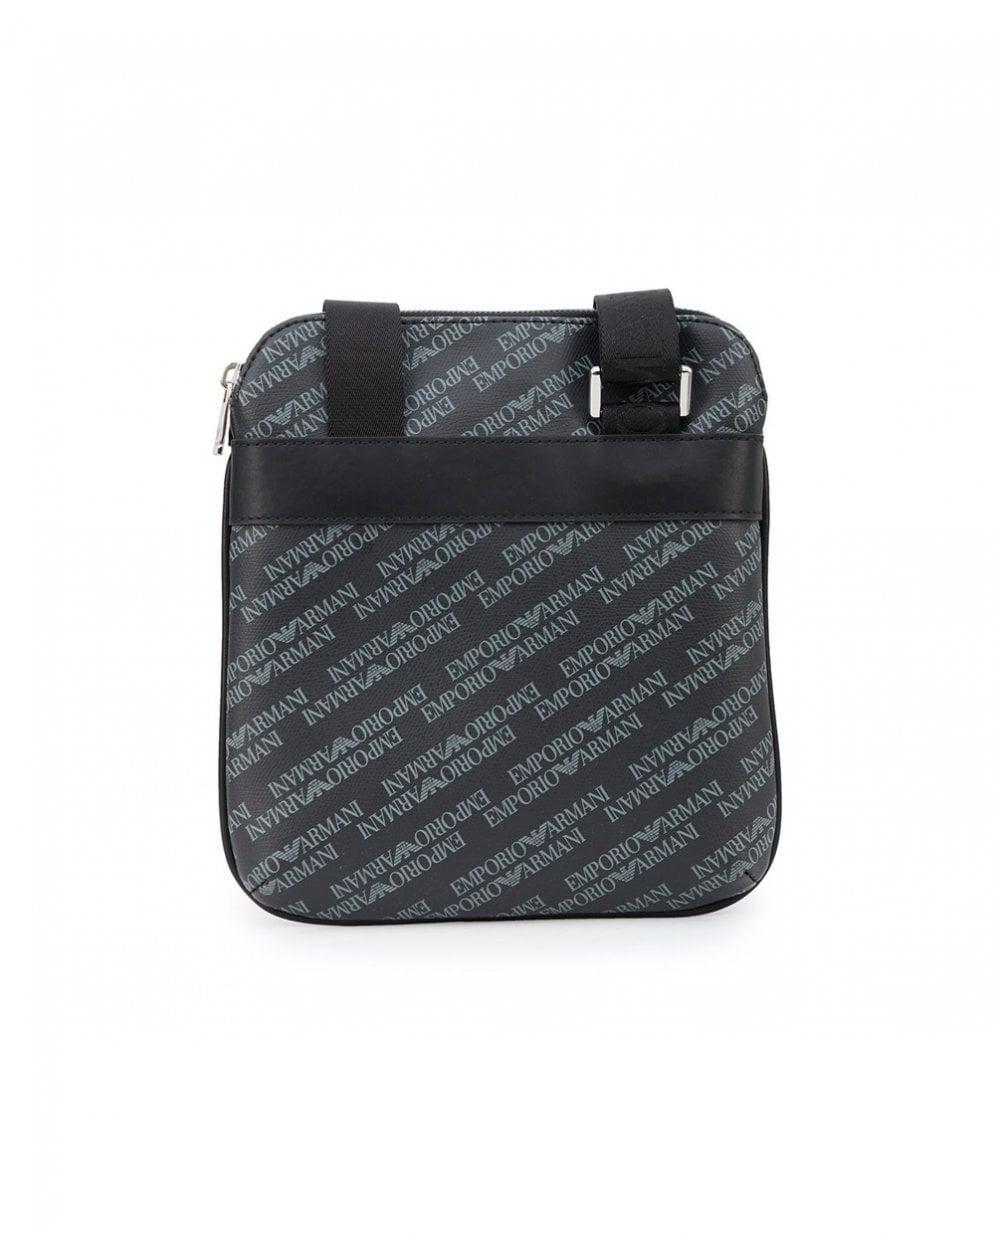 Armani Jeans All Over Logo Leather Stash Bag in Black for Men - Lyst 650afceab6274